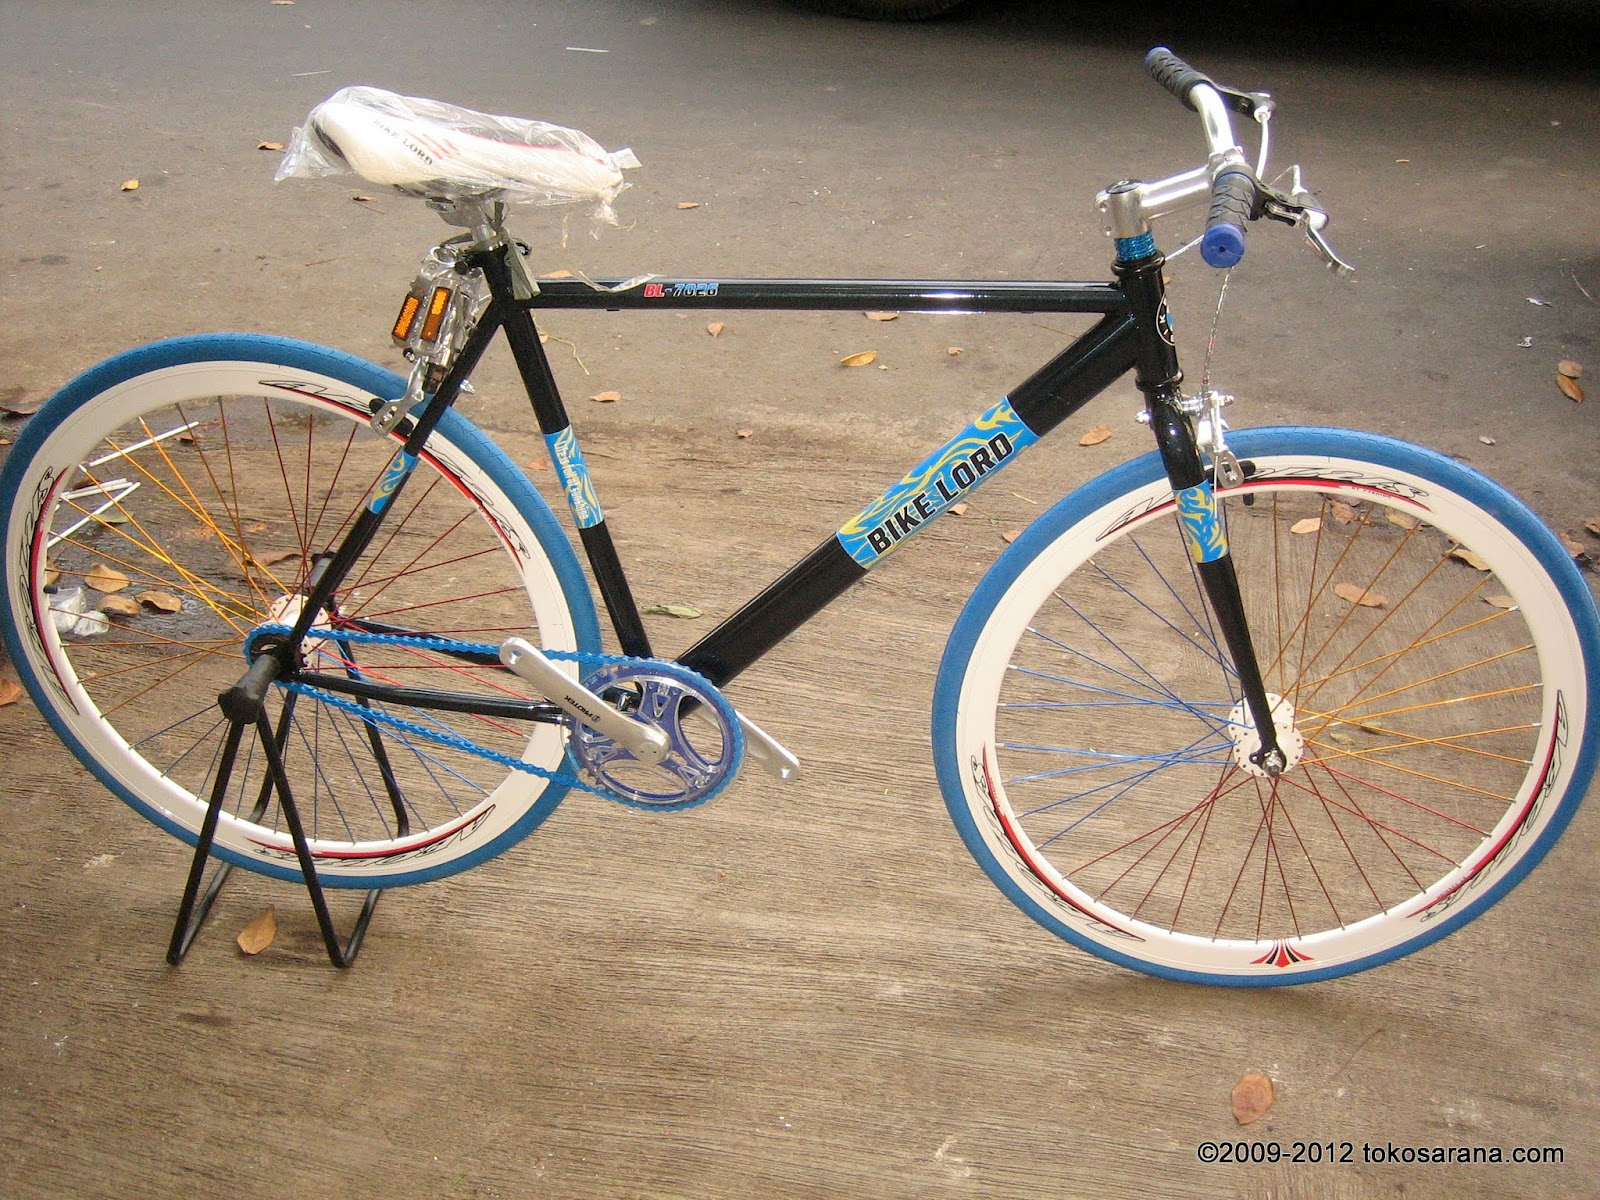 Sepeda Fixie Bikelord Bl7026 Flip Flop Hub 700c News Untuk Anak Anda